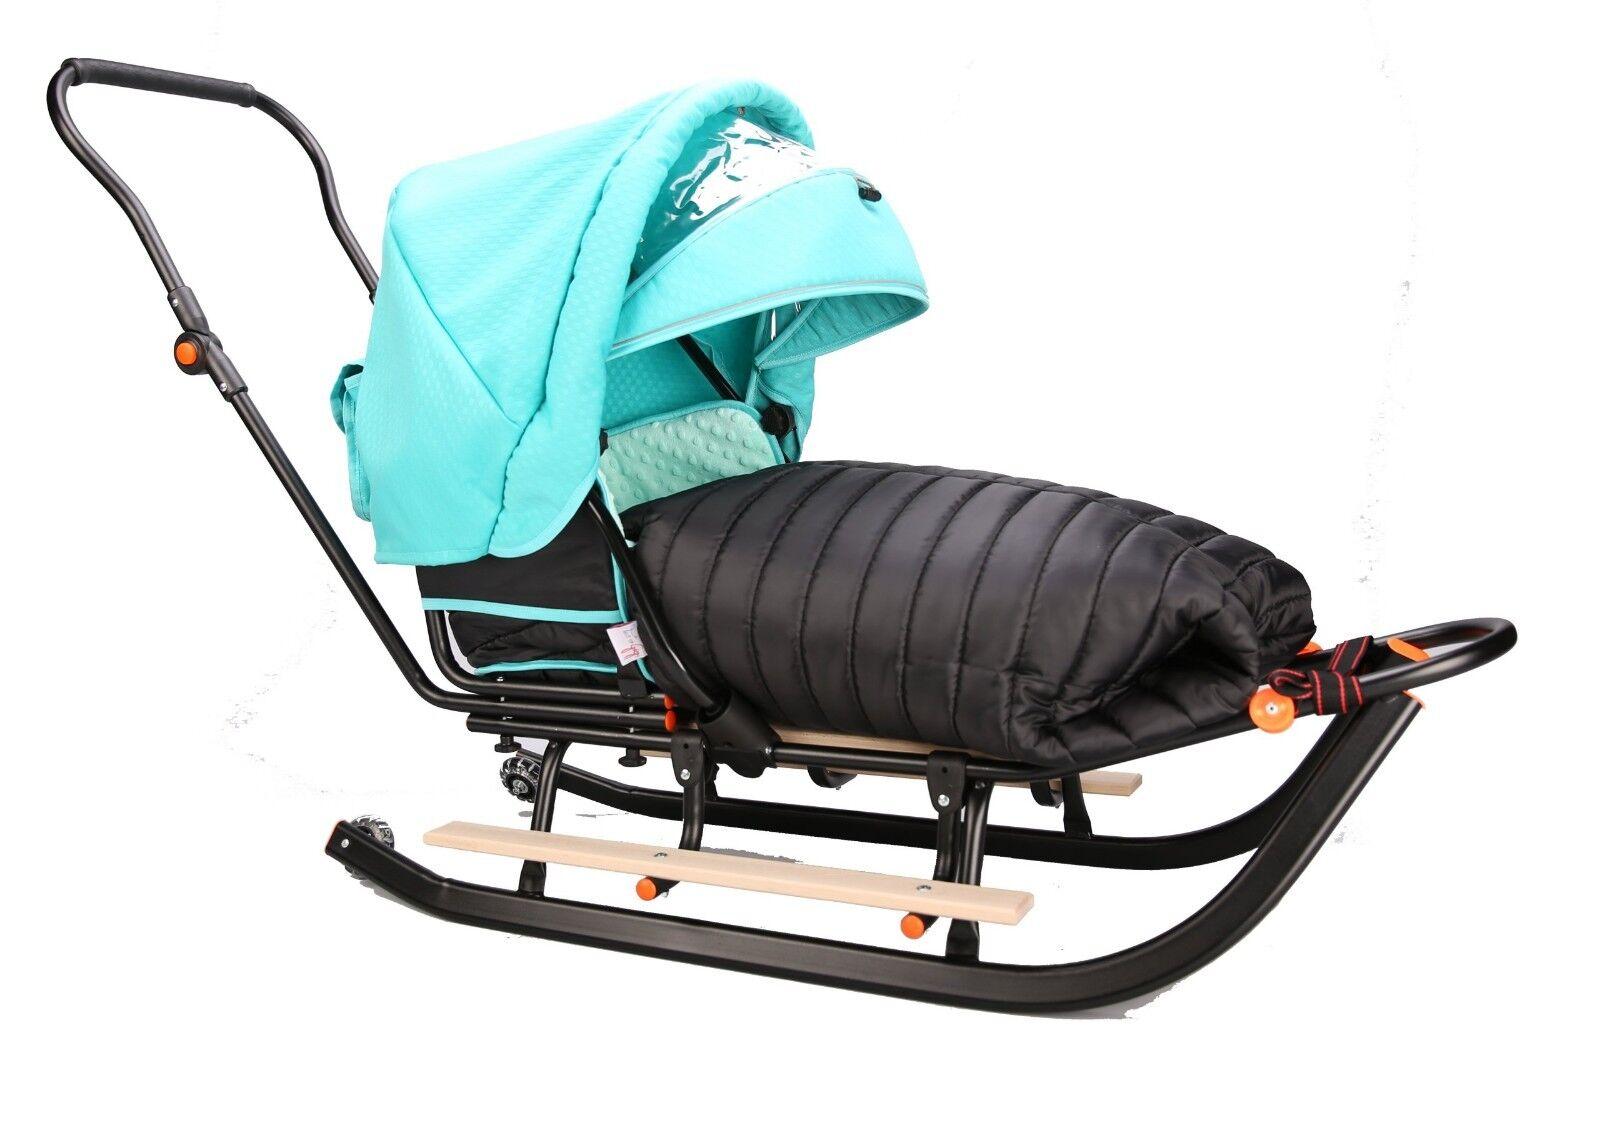 Nuevo Grande 112cm Negro 3in1 nieve trineo con saco, Reposapiés & Luz LED